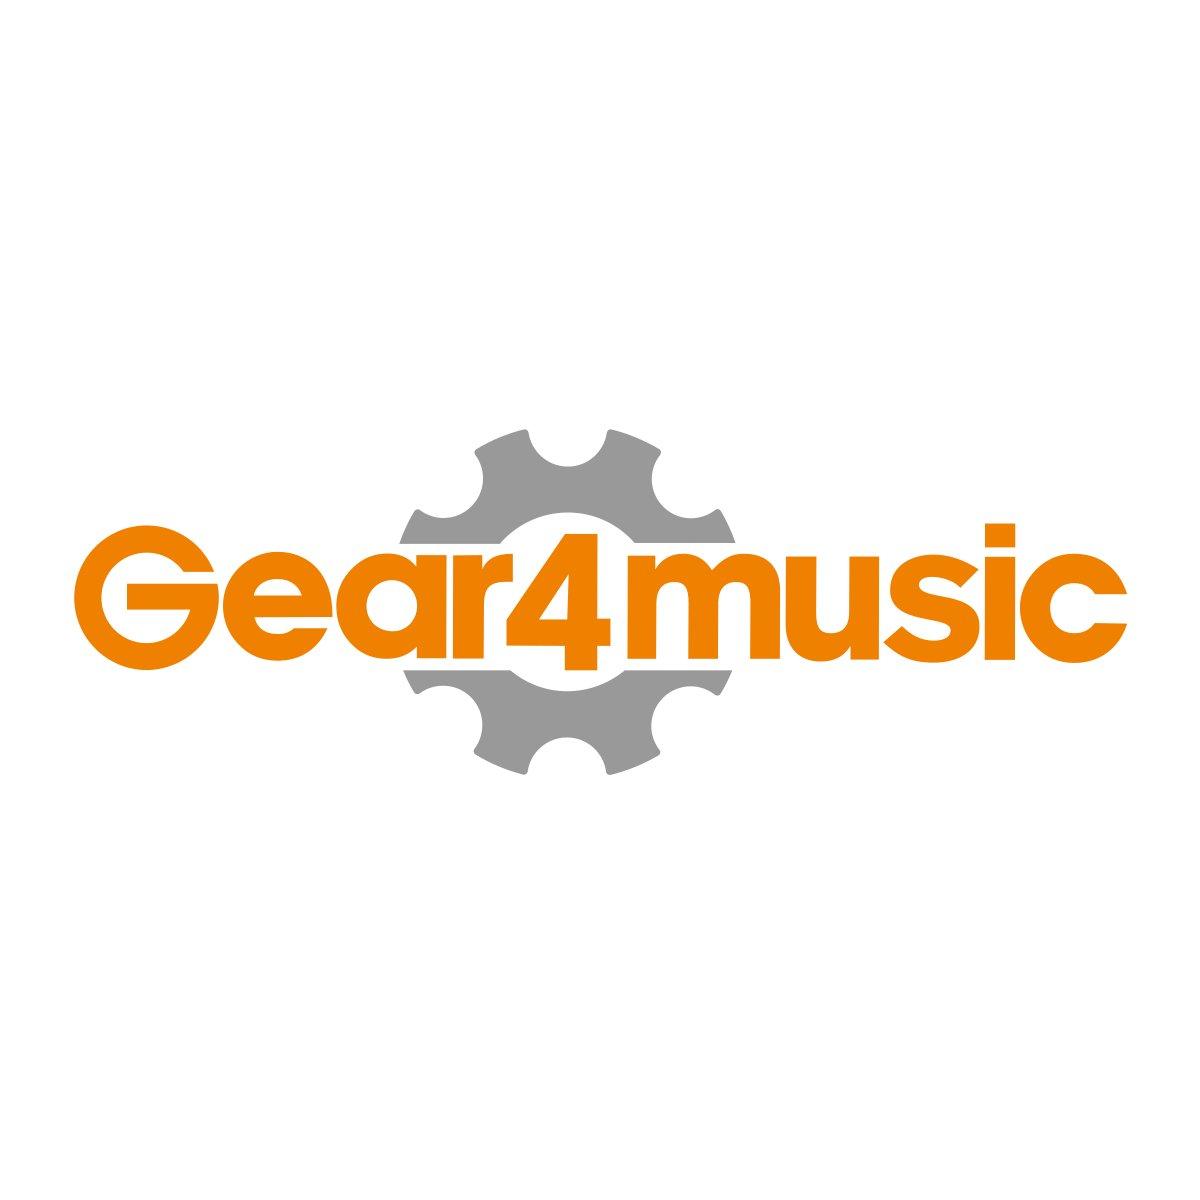 KRK Ultimate Home Studio Bundle - Gear4music Exclusive